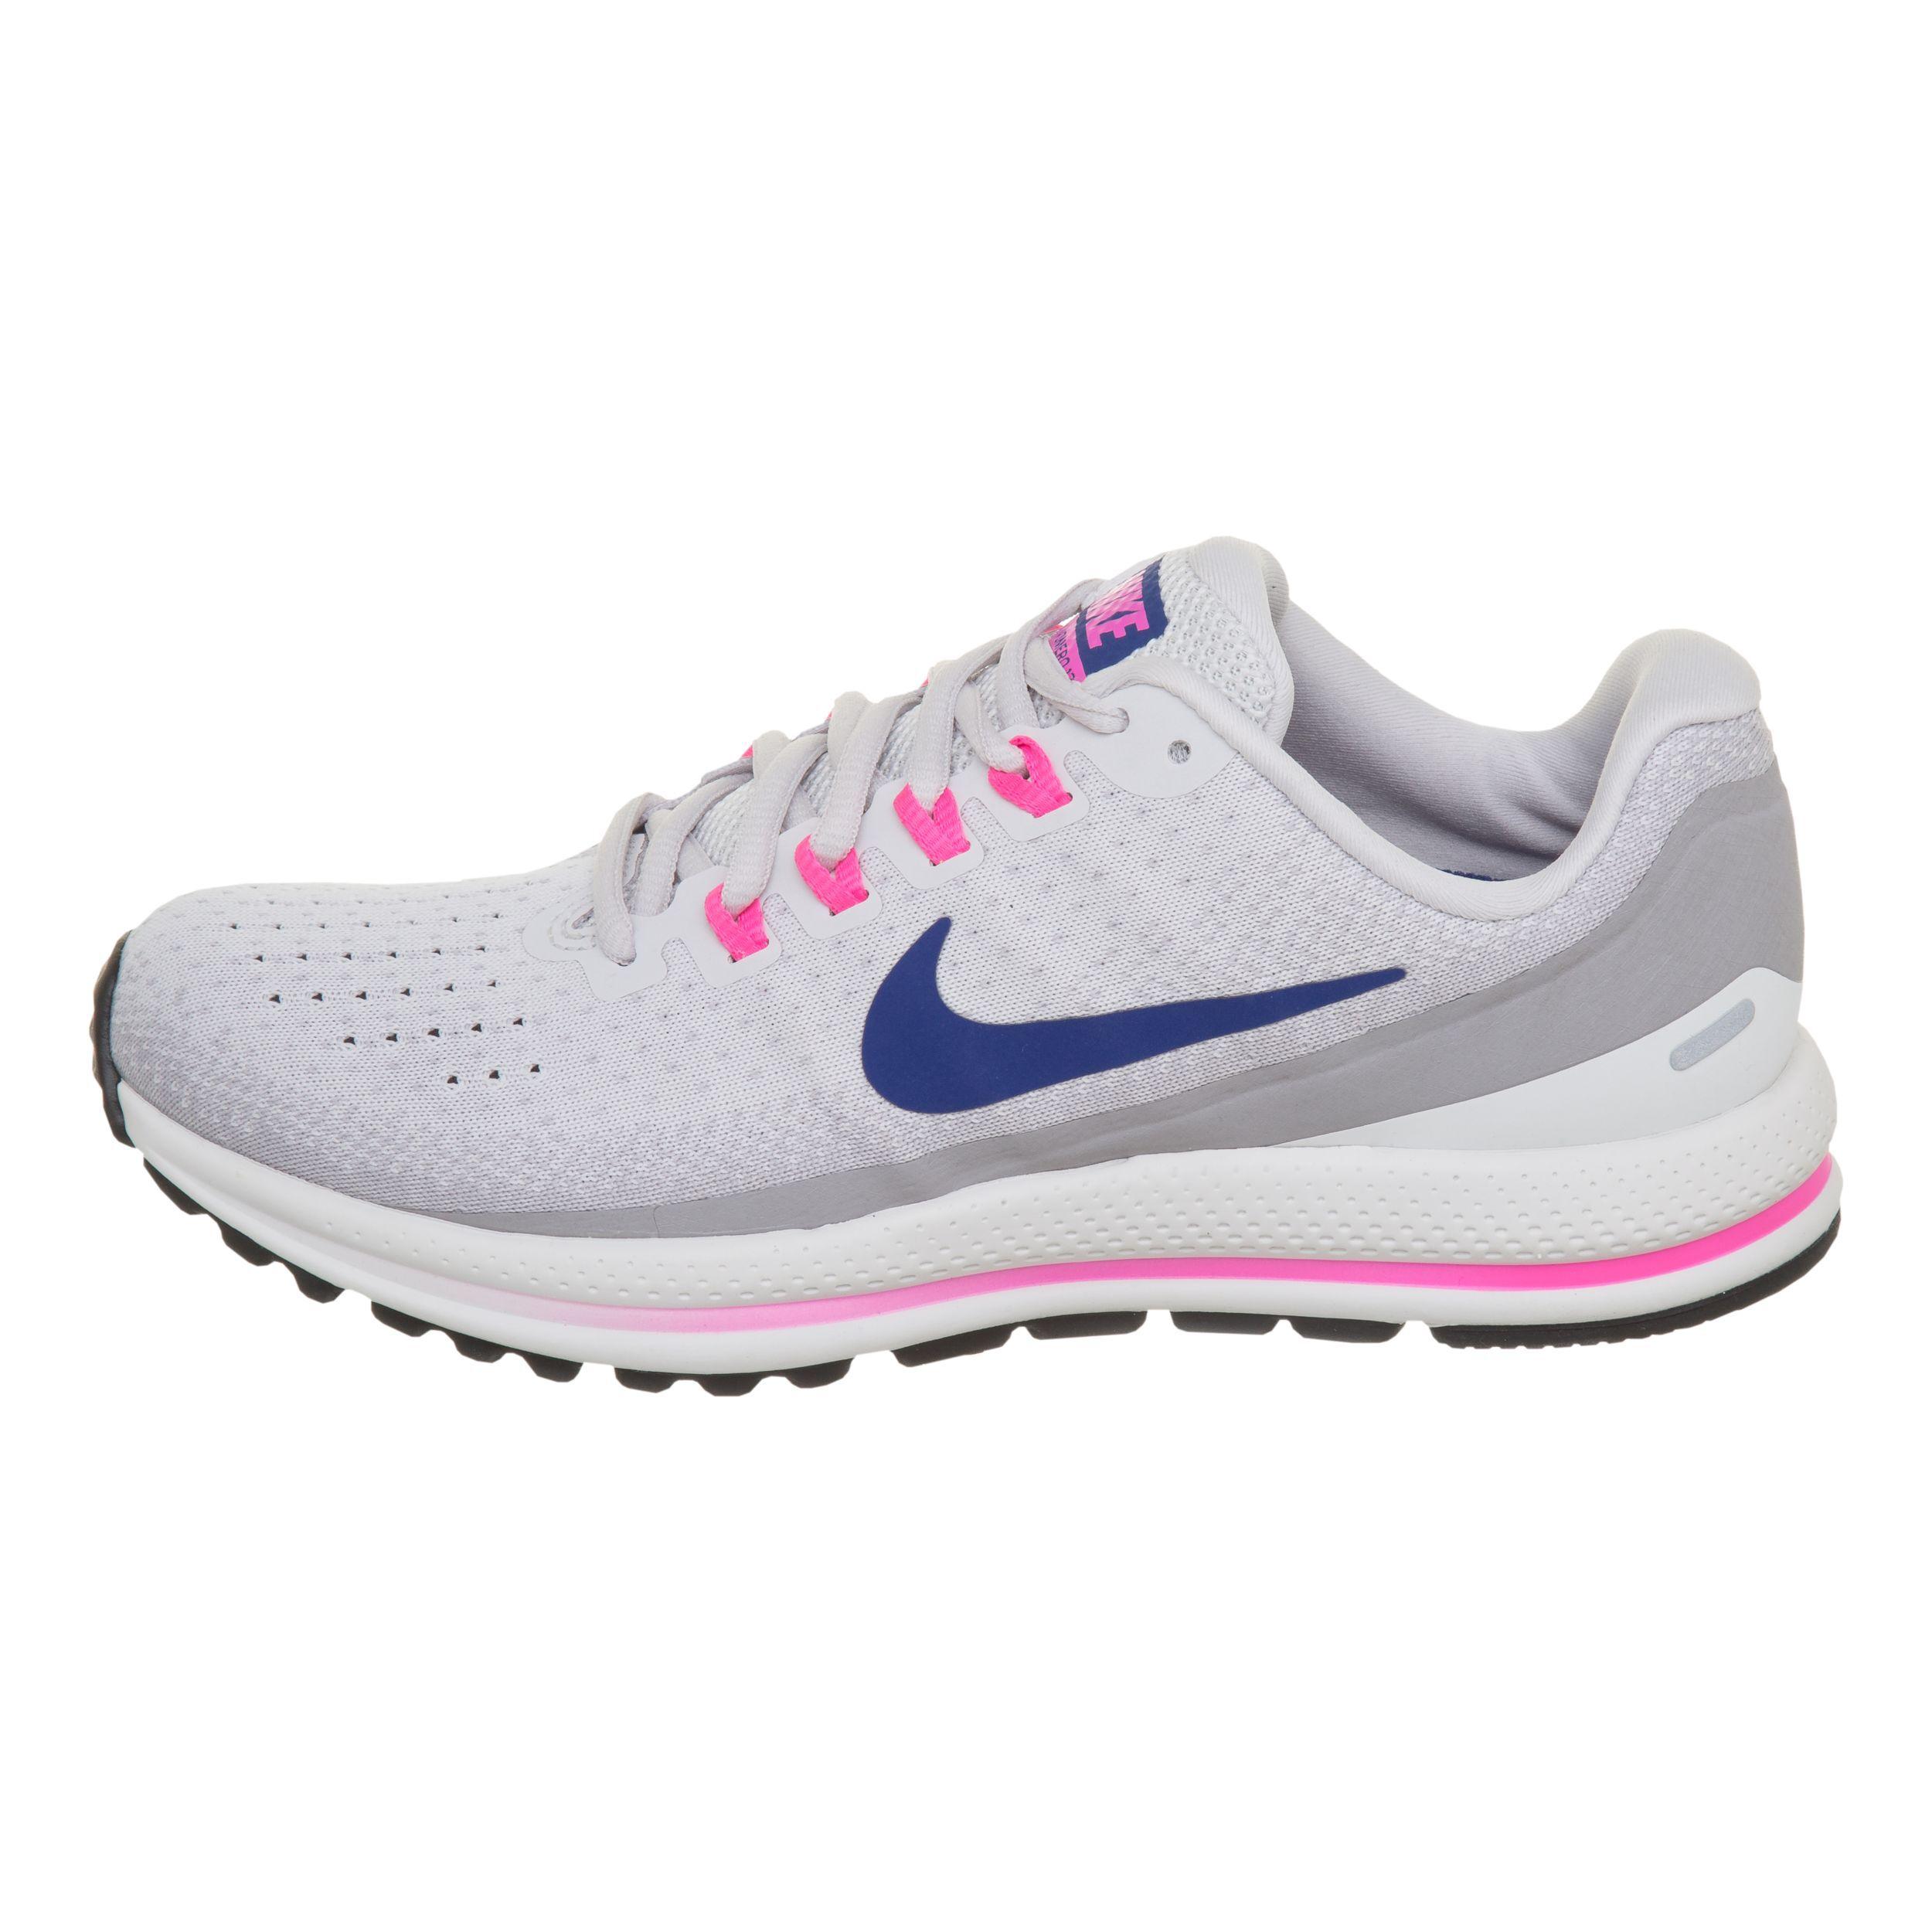 Nike Air Zoom Vomero 13 Neutralschuh Damen Hellgrau, Pink